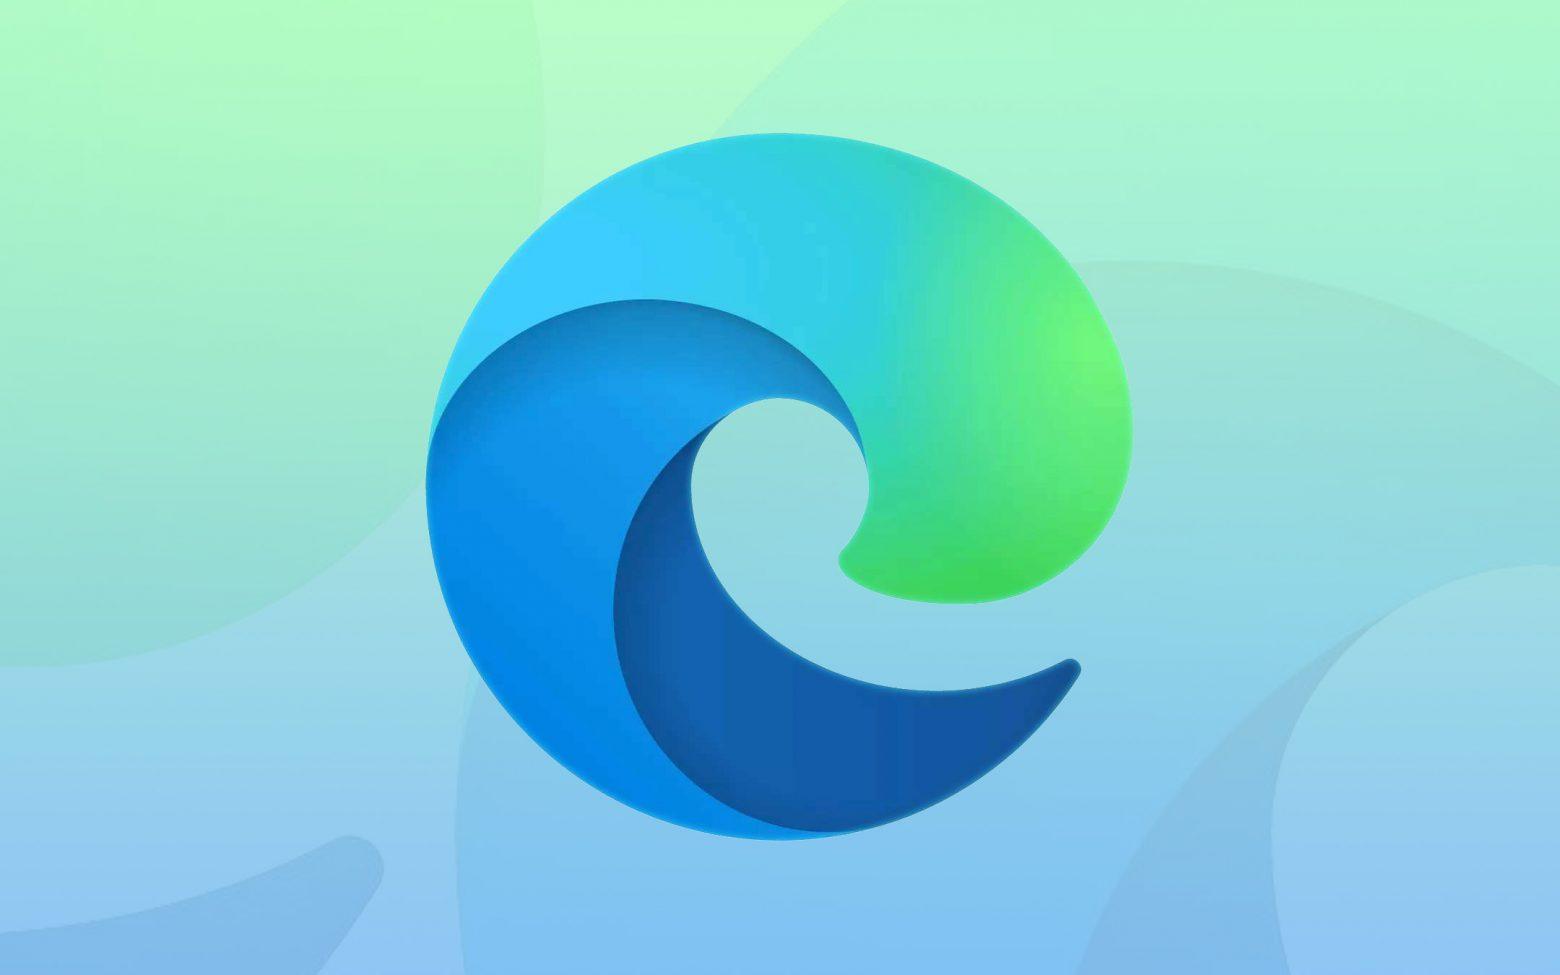 Come utilizzare Microsoft Edge Chromium